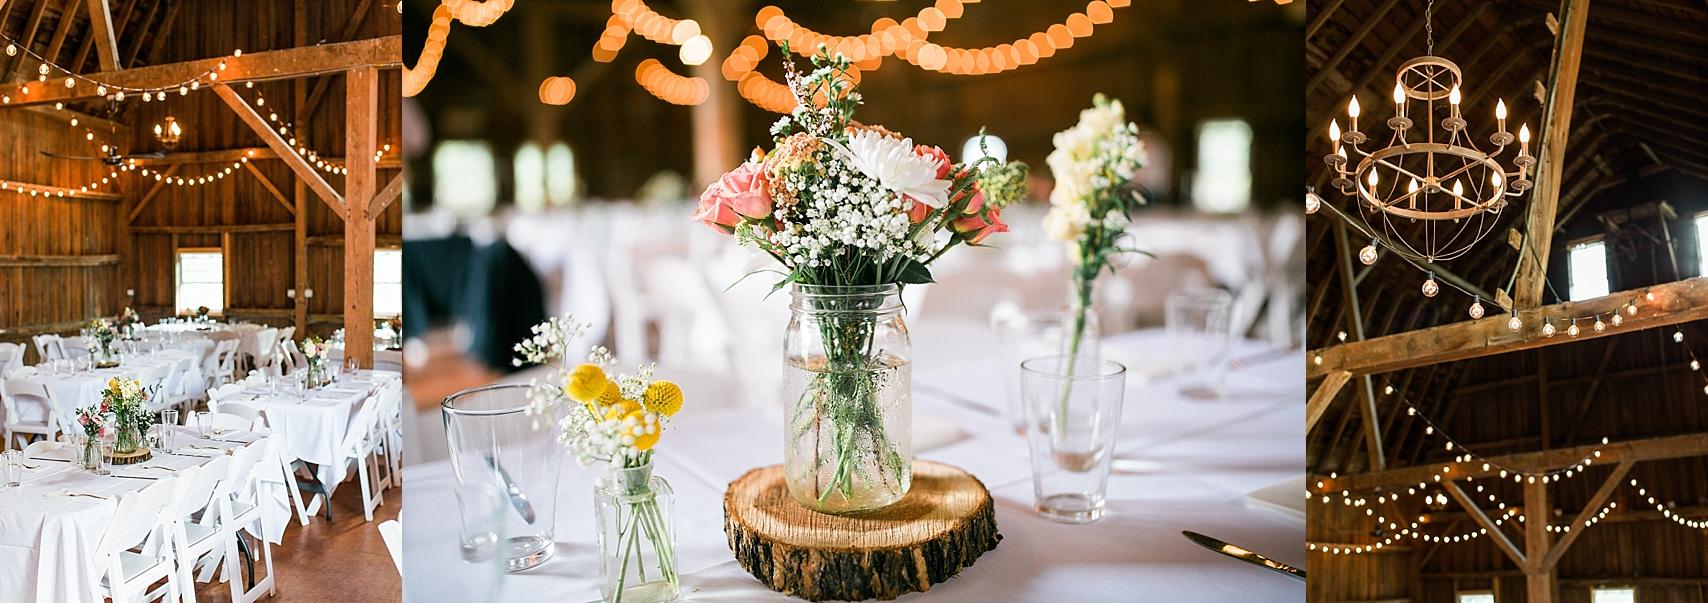 Minnesota Minneapolis Wedding Photographer Best Of 2018 Weddings Mallory Kiesow Photography_0008.jpg